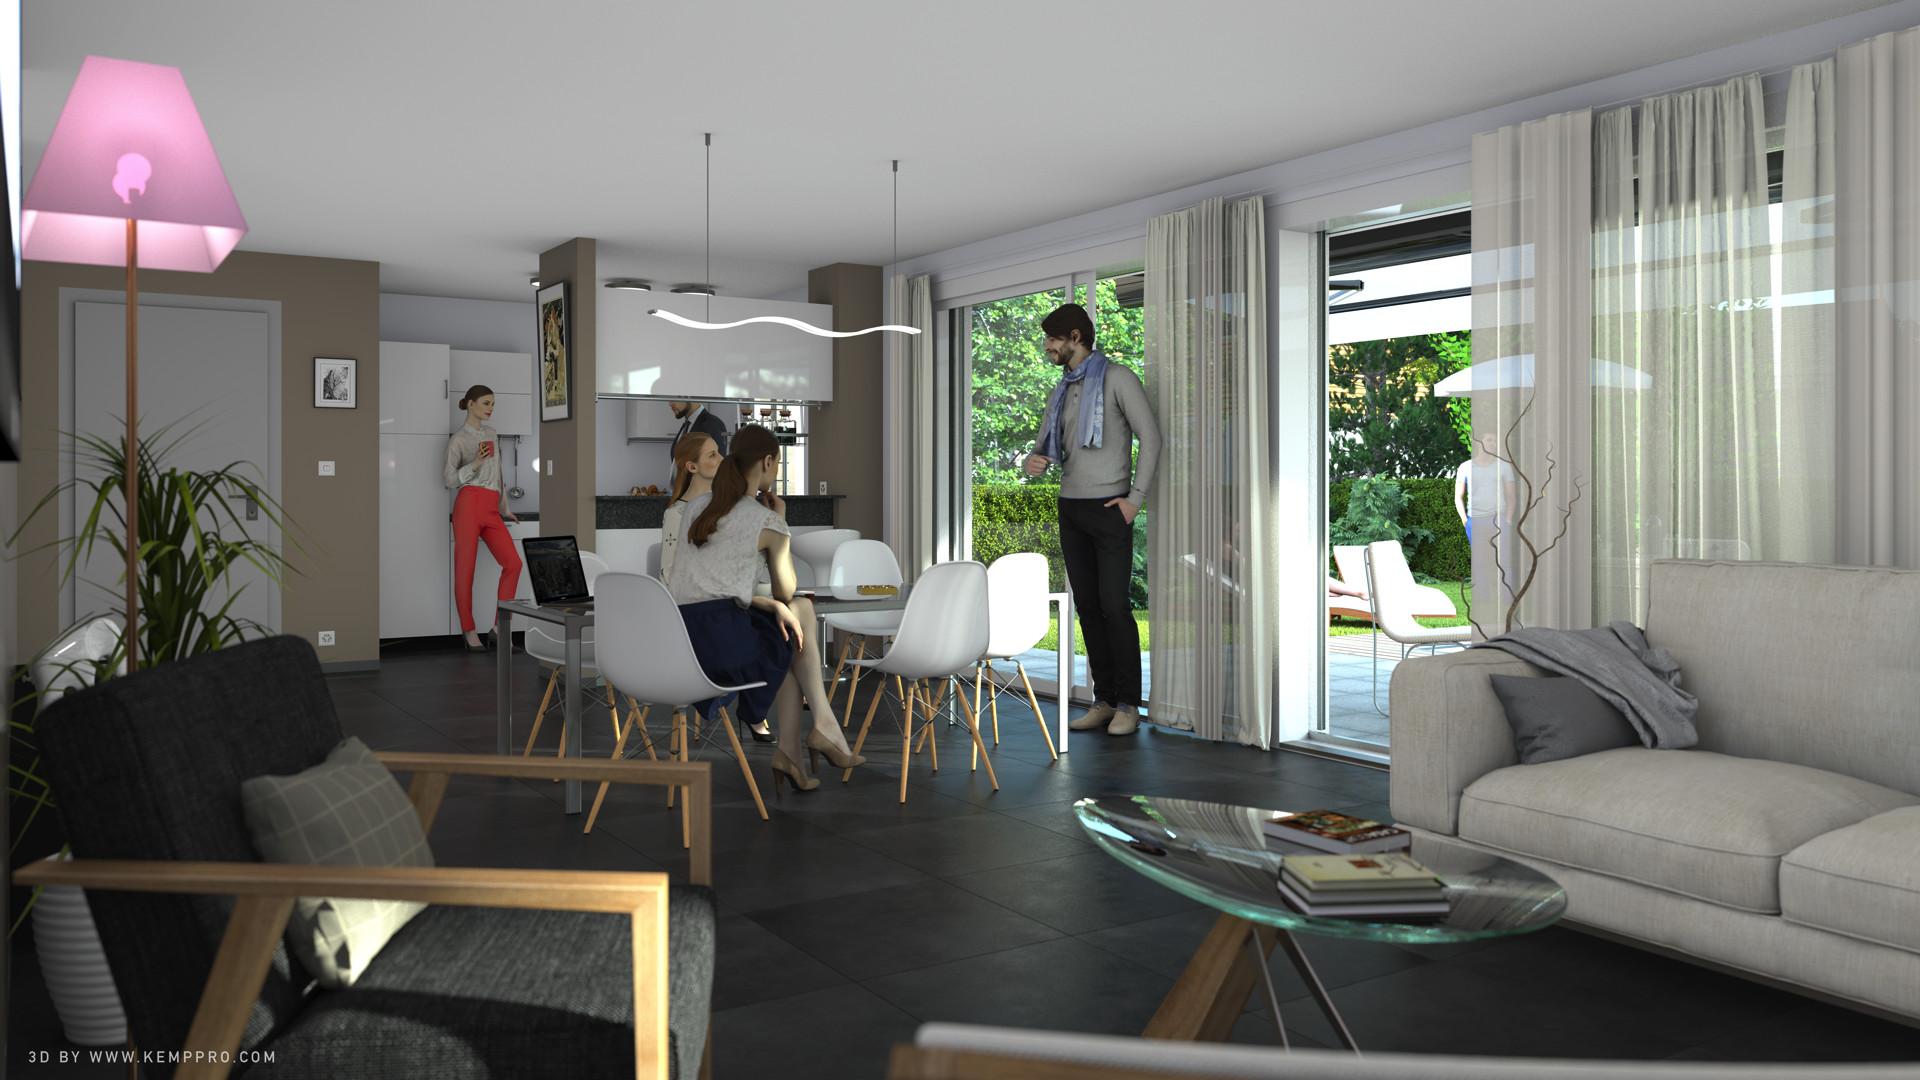 Duane kemp house model test 2 scene 13 with lights kp hd1080